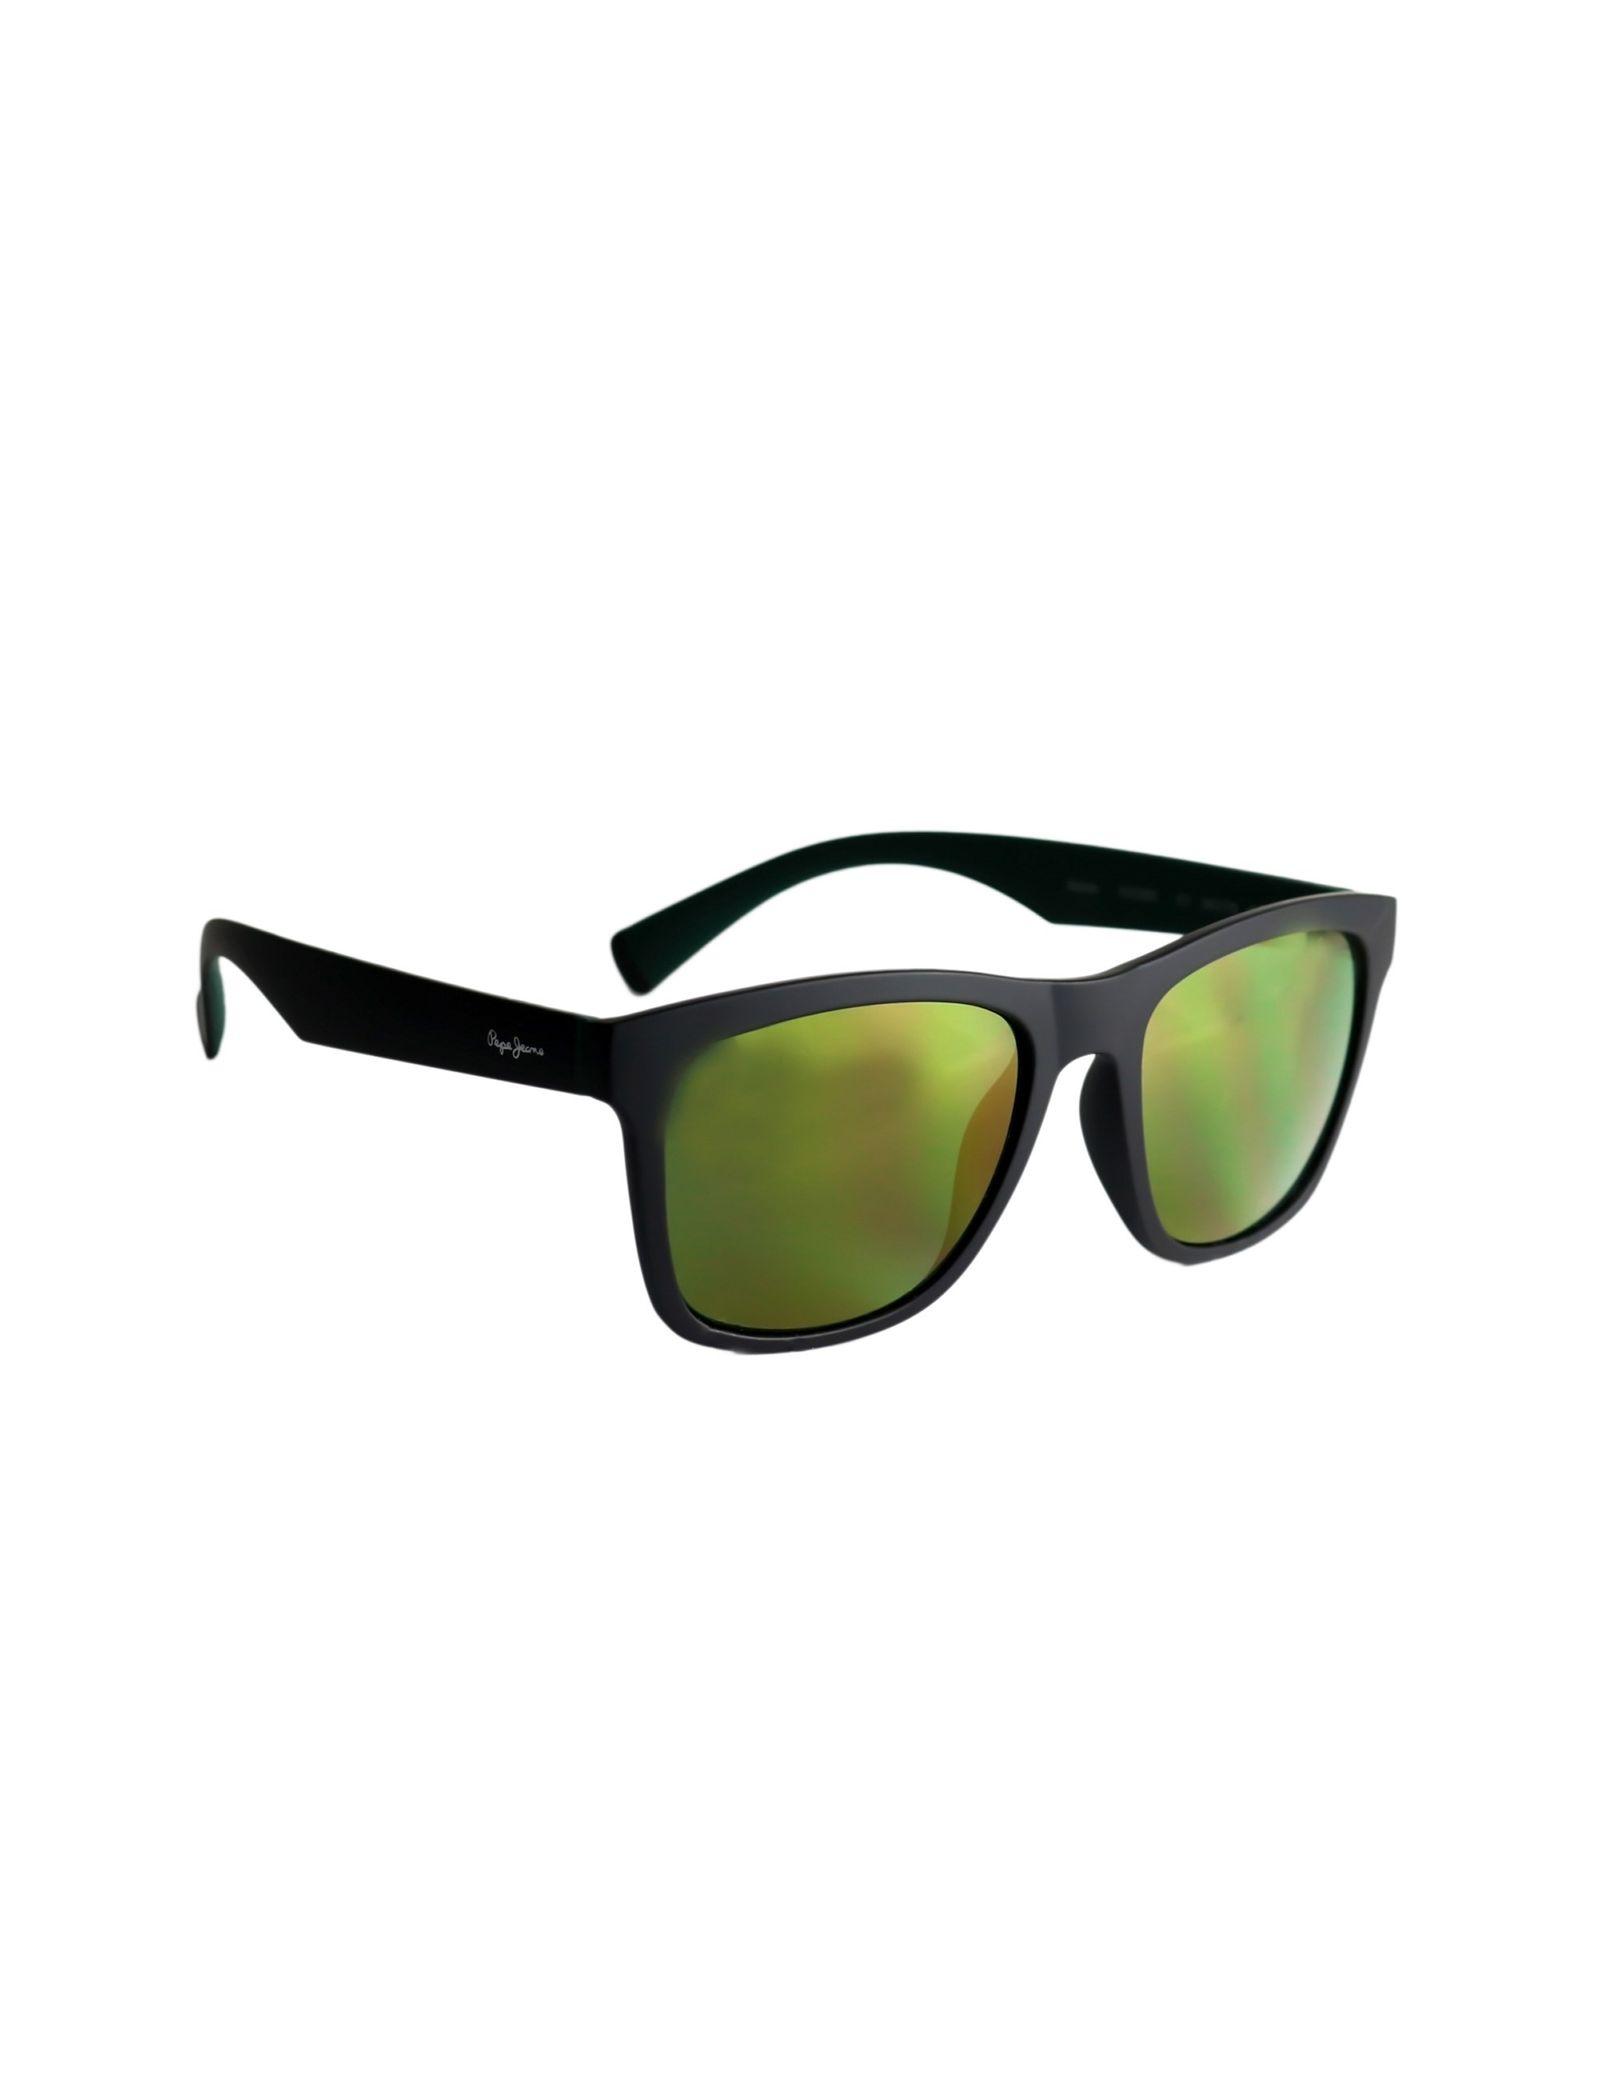 عینک آفتابی ویفرر مردانه - پپه جینز - مشکي - 2